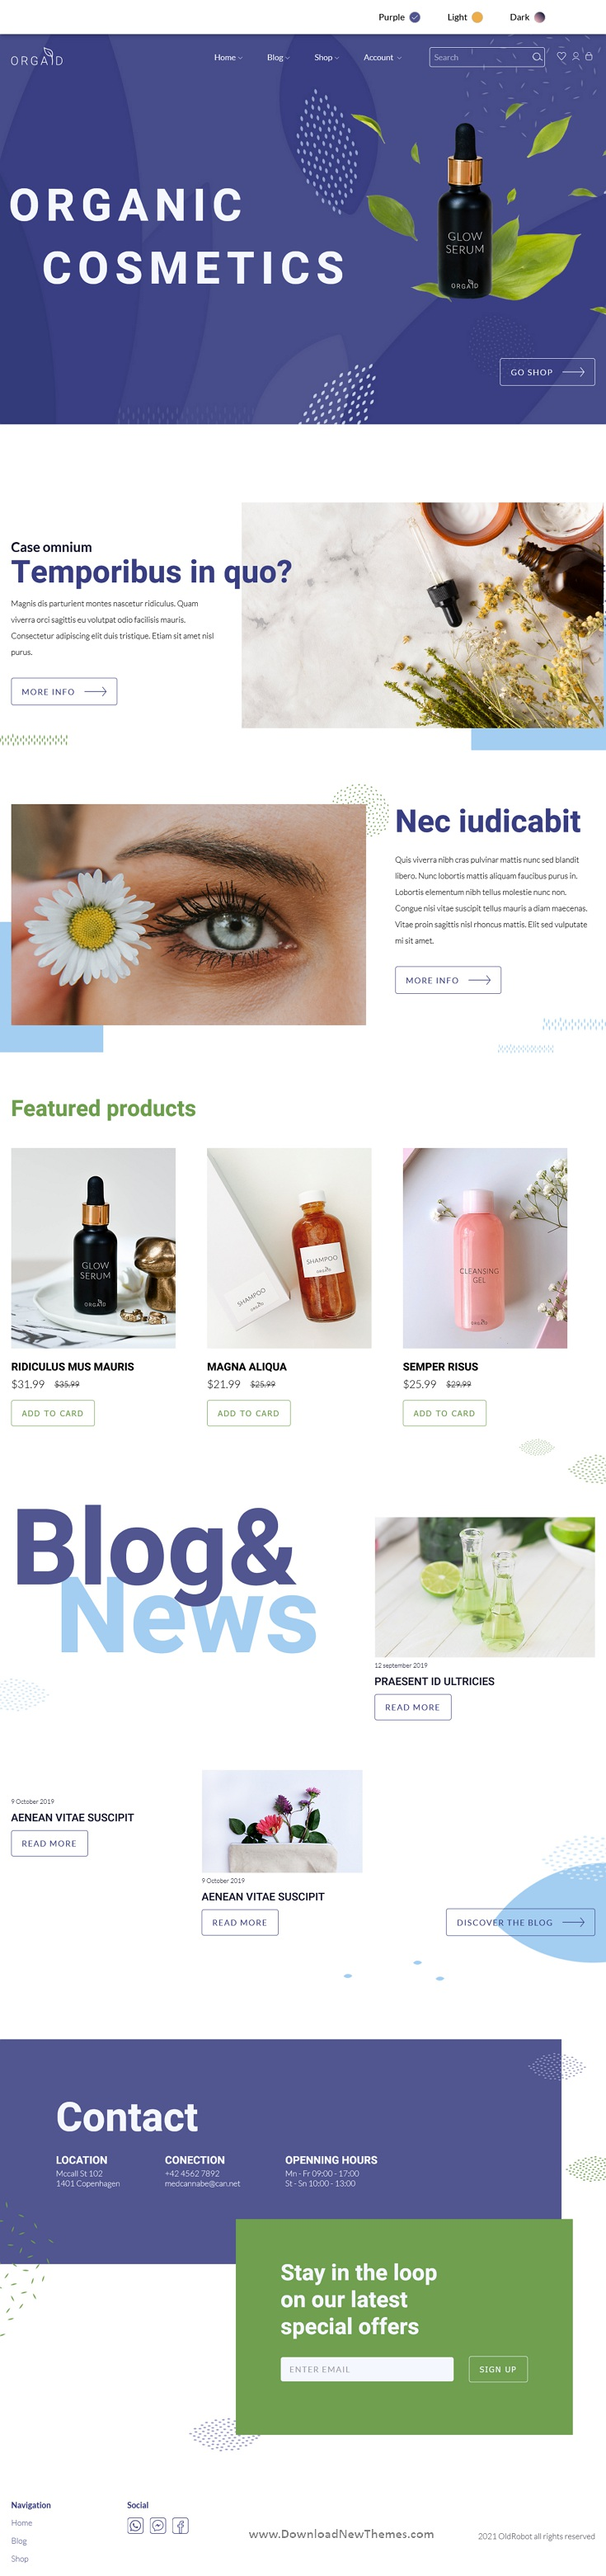 Organic Cosmetics & Beauty Shop Responsive Theme